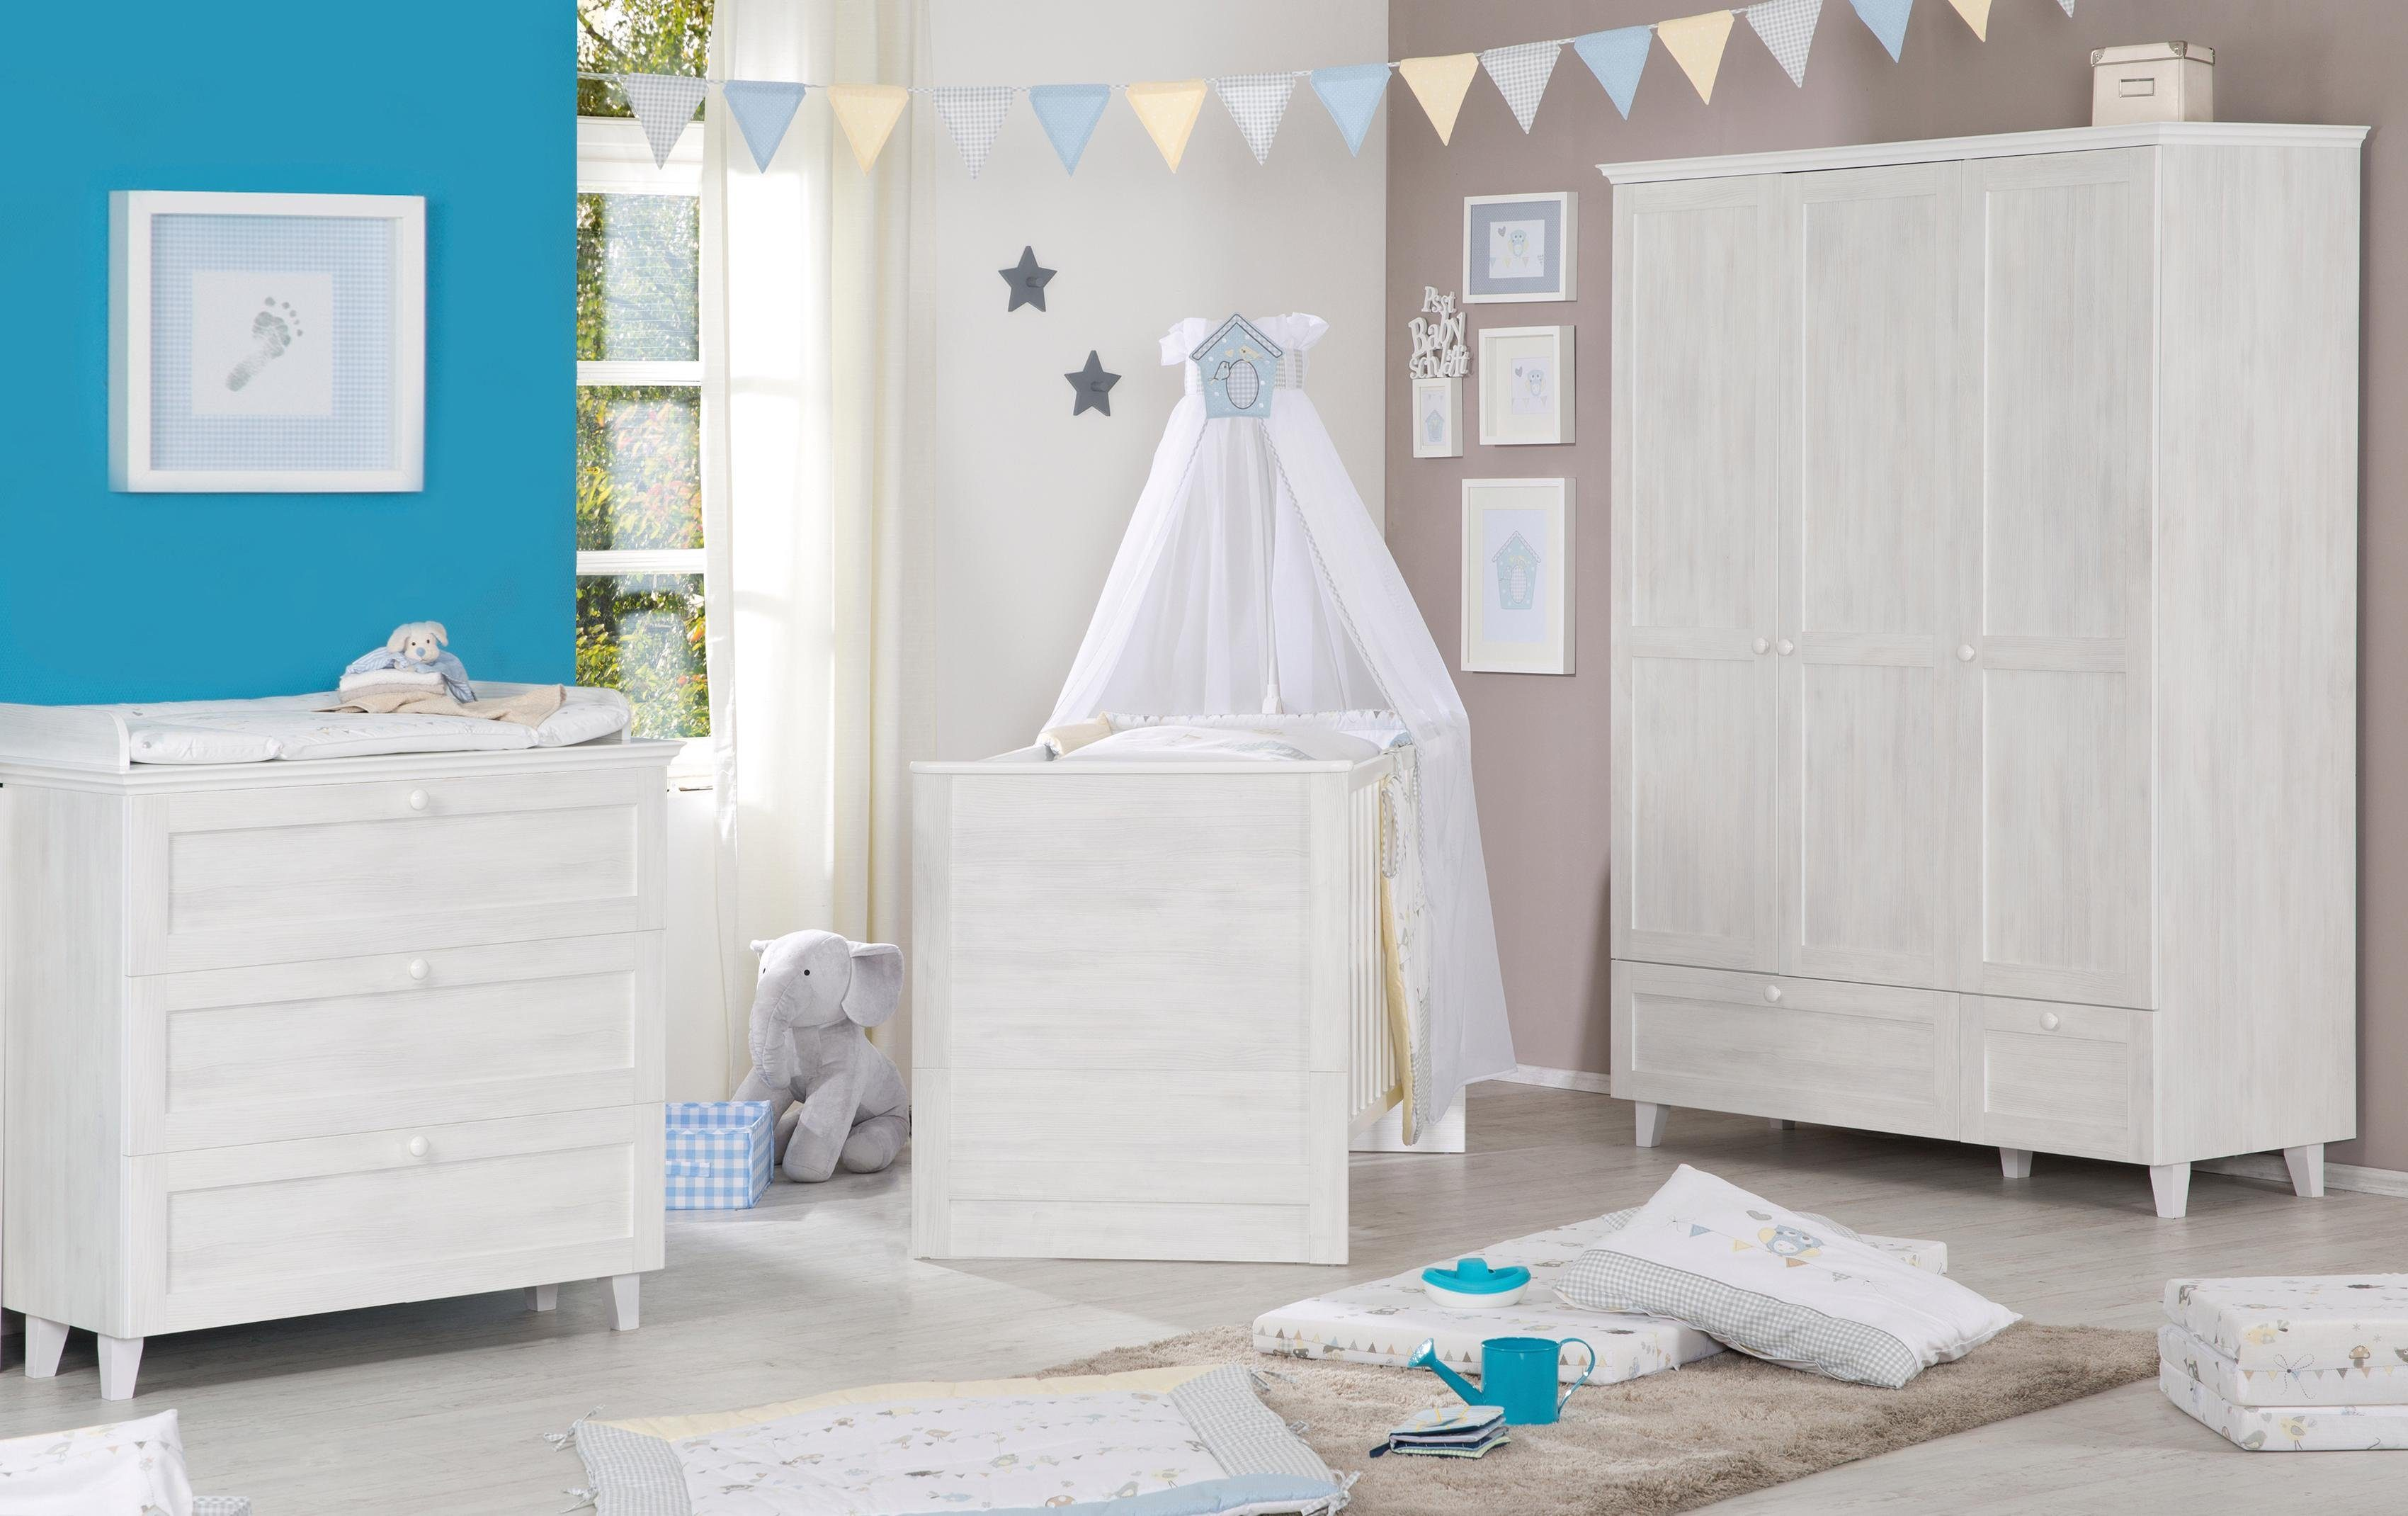 Gordijn Babykamer Babykamers : Complete babykamer shoppen nu gratis thuisbezorgd otto